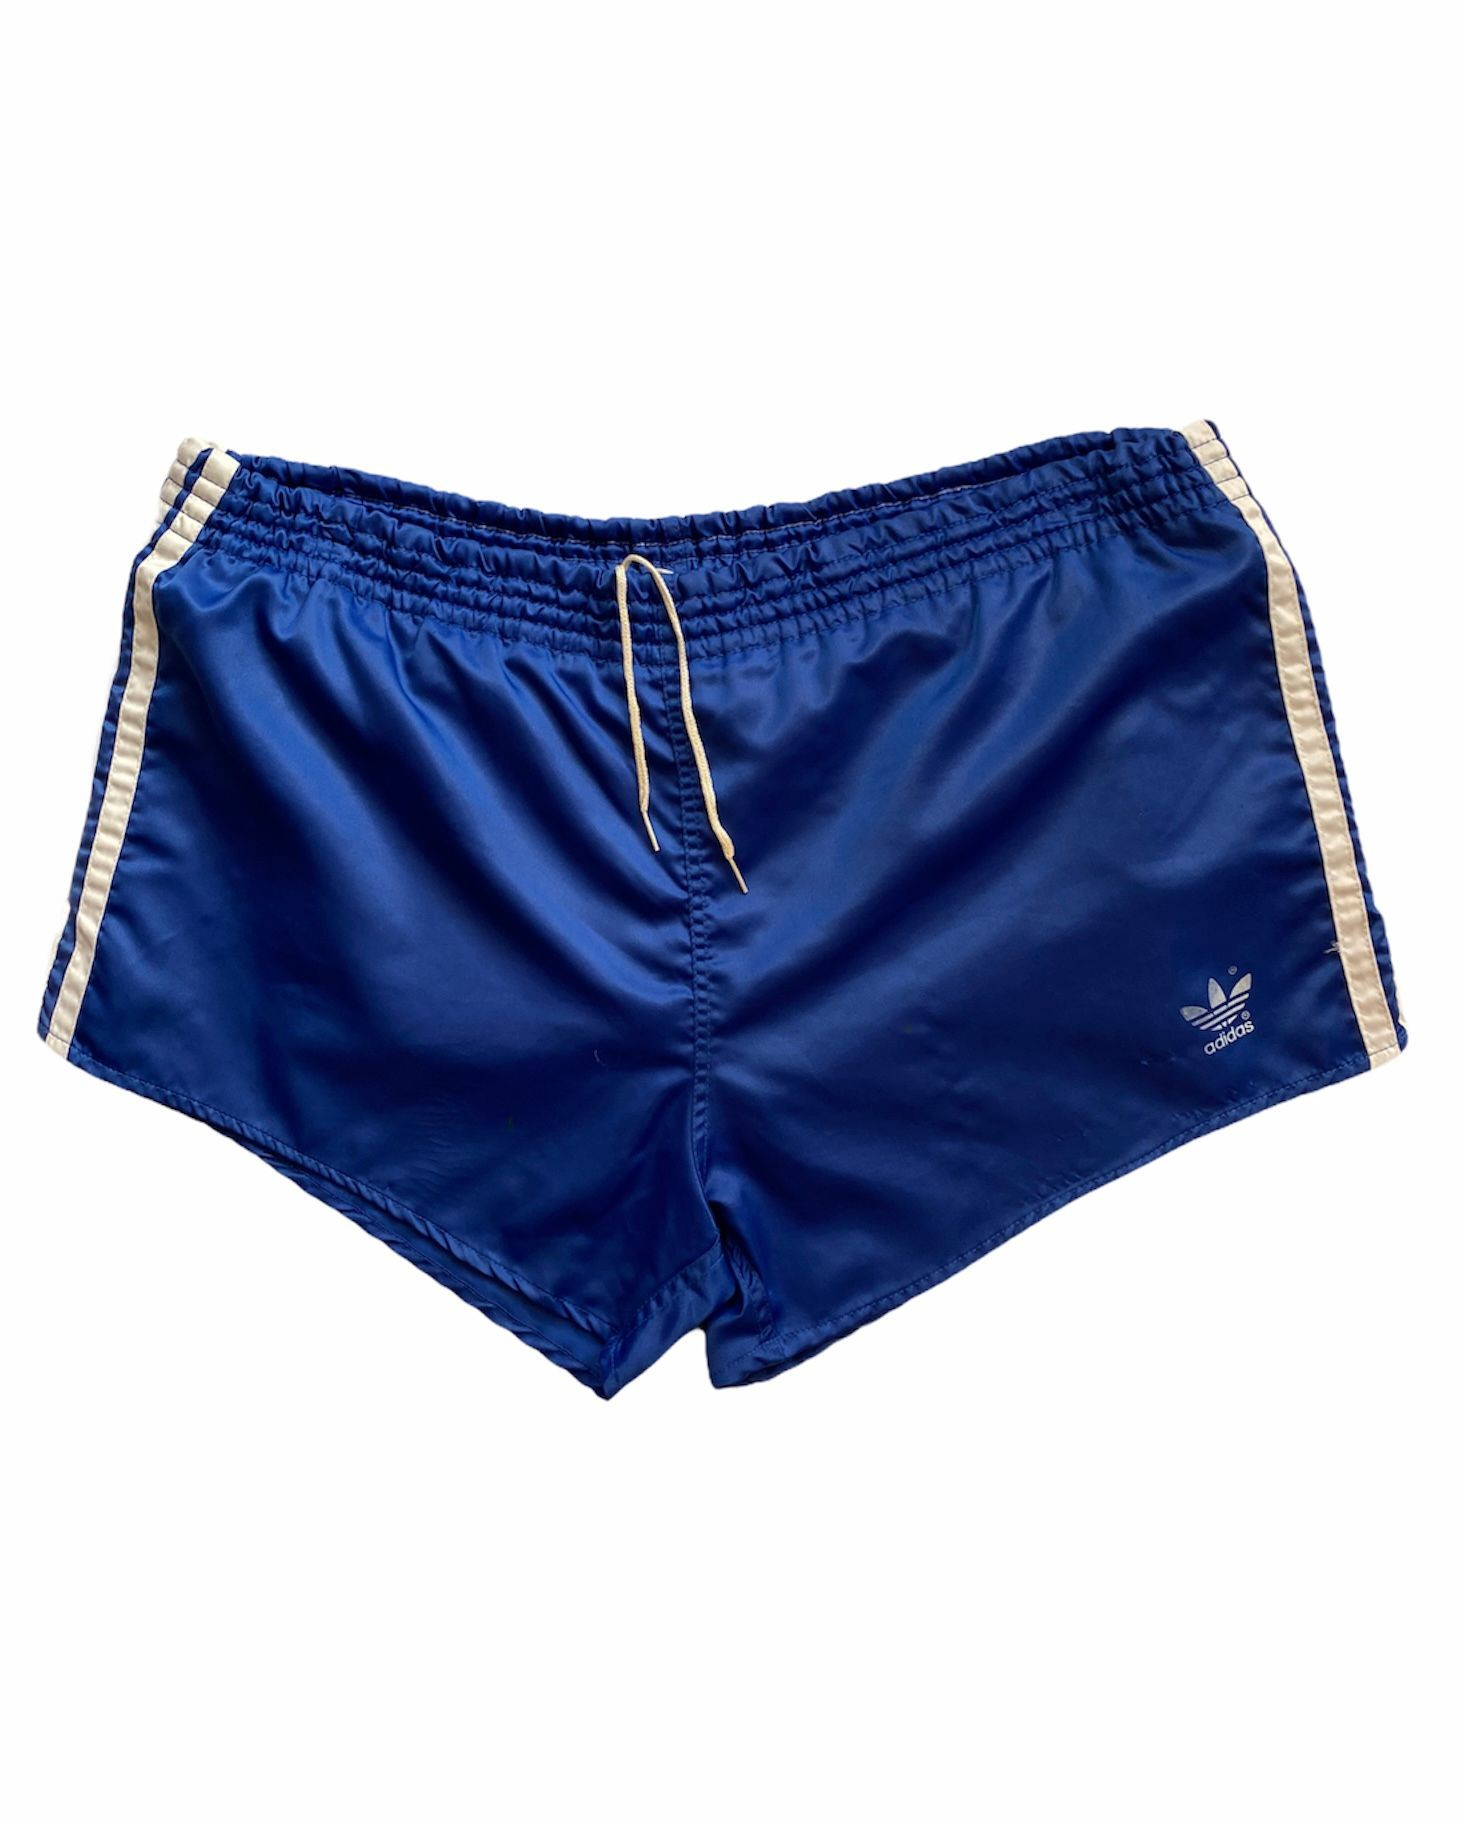 Adidas Originals 90's Blue Şort (L)